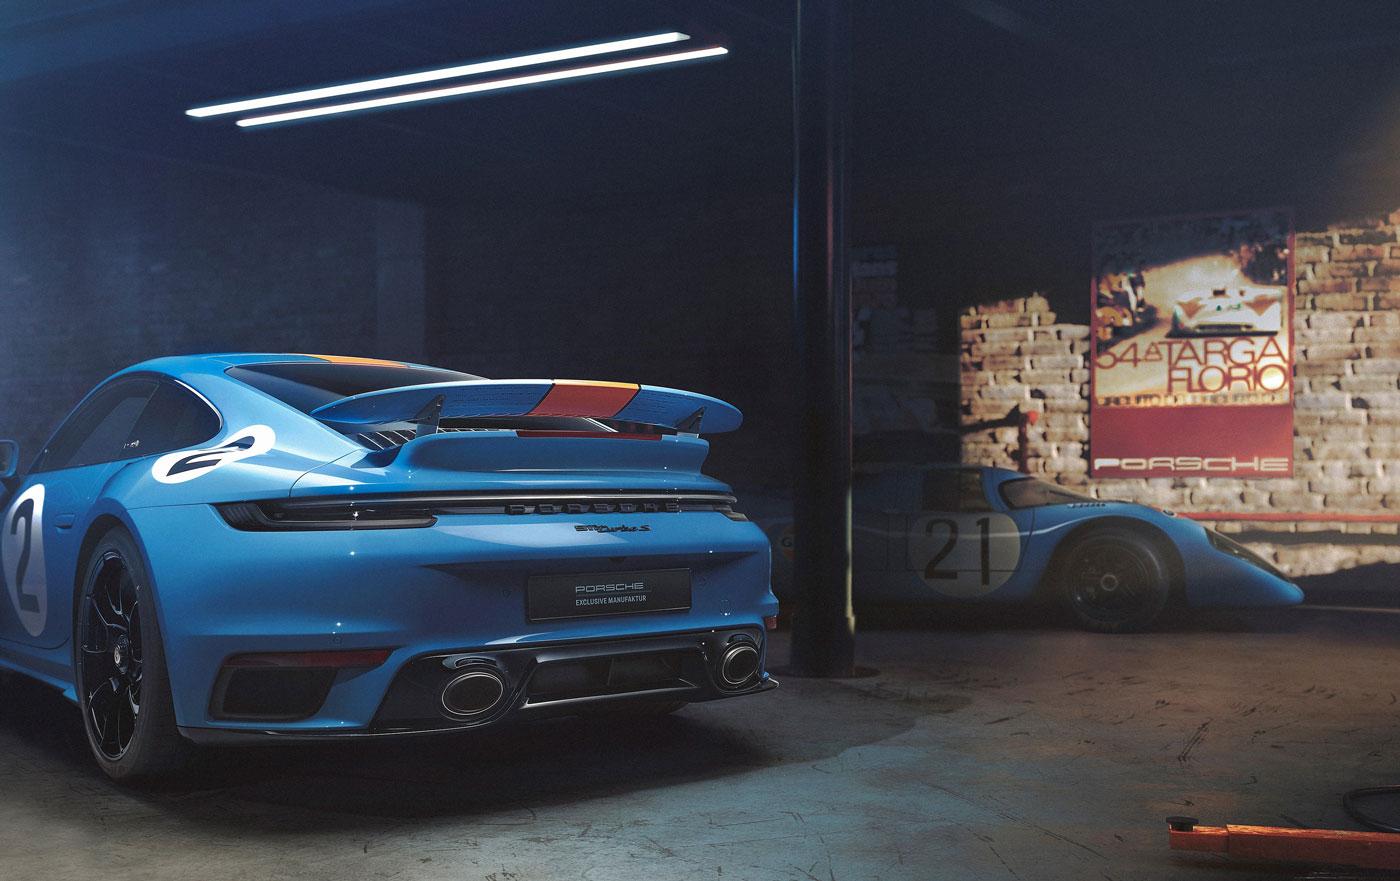 Porsche-992-Turbo-S-Pedro-Rodriguez